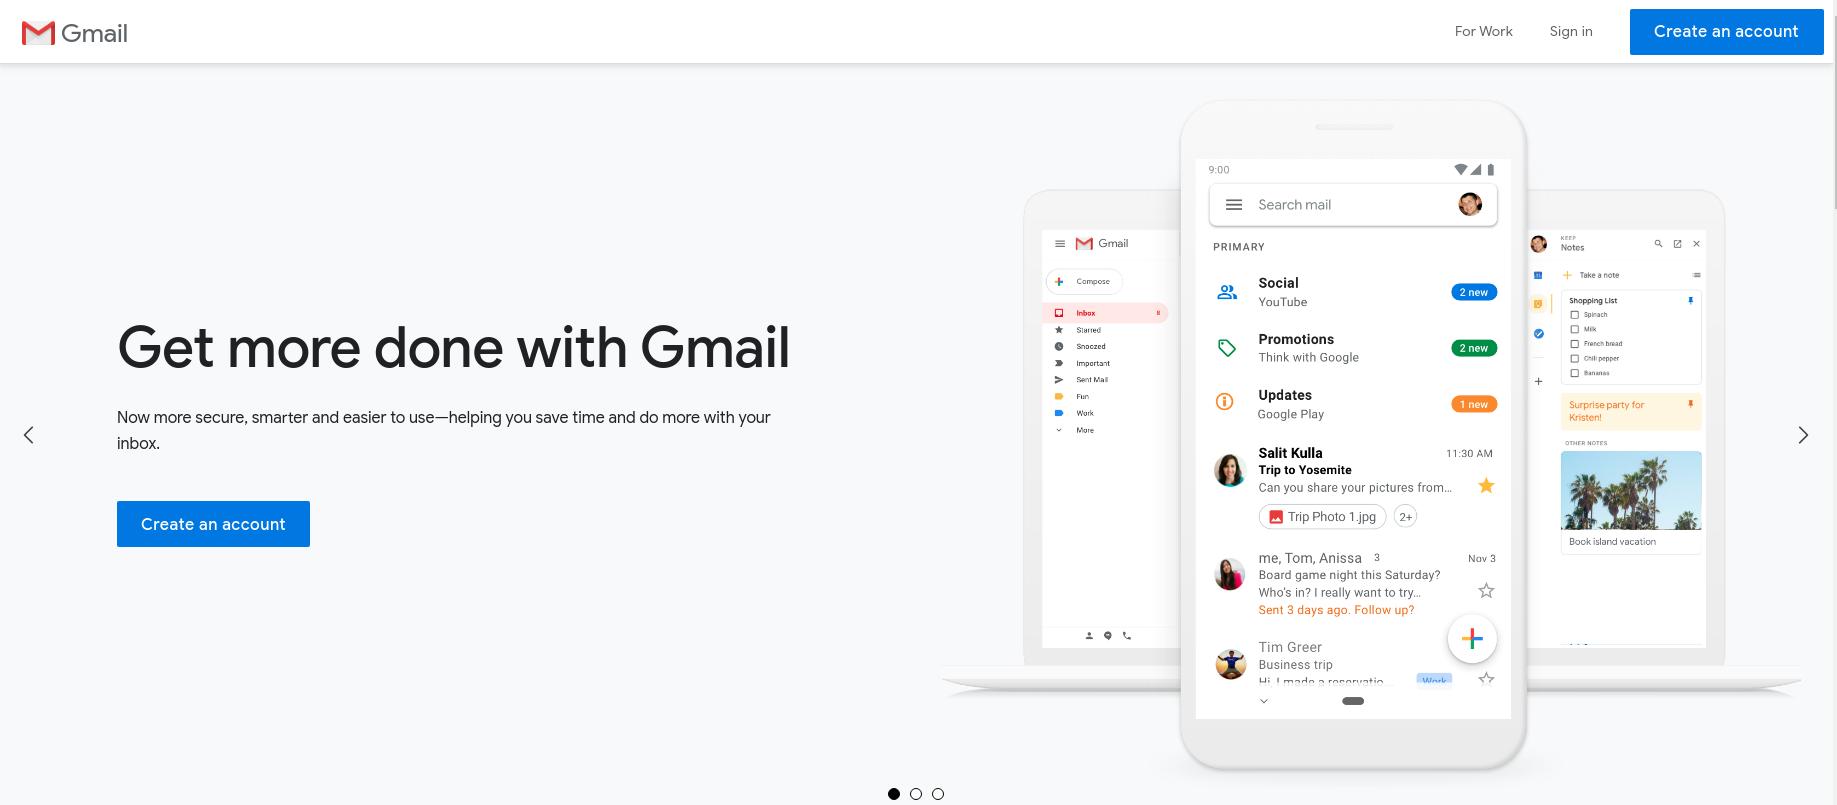 gmail login homepage